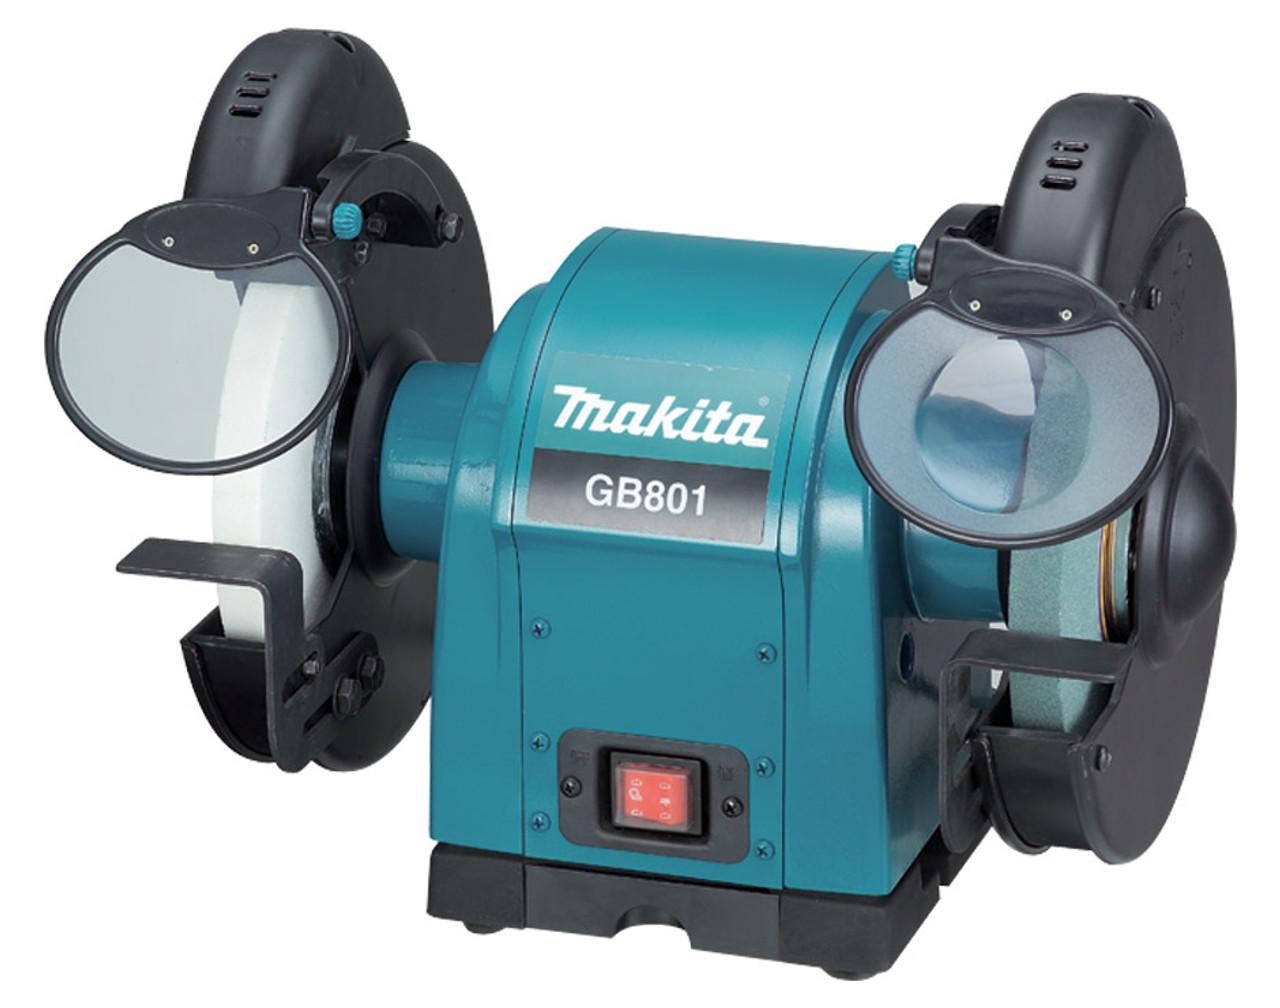 Makita Bench Grinder, 205mm x 19mm, 550W GB801